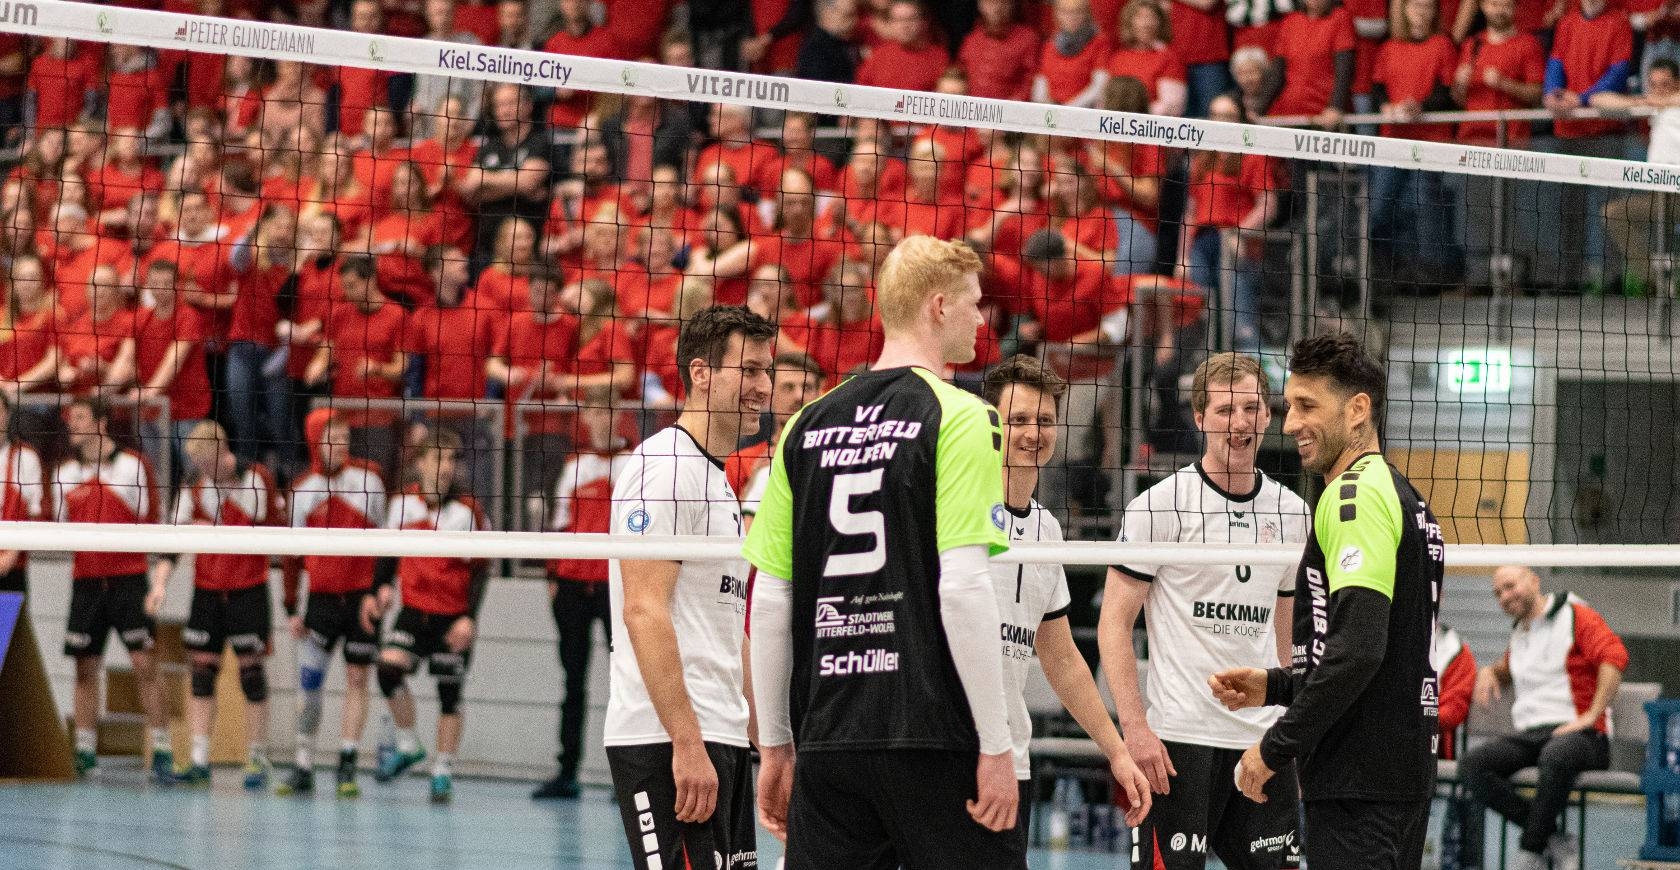 Kiel Volleyball Adler Bundesliga 8 Volleyball